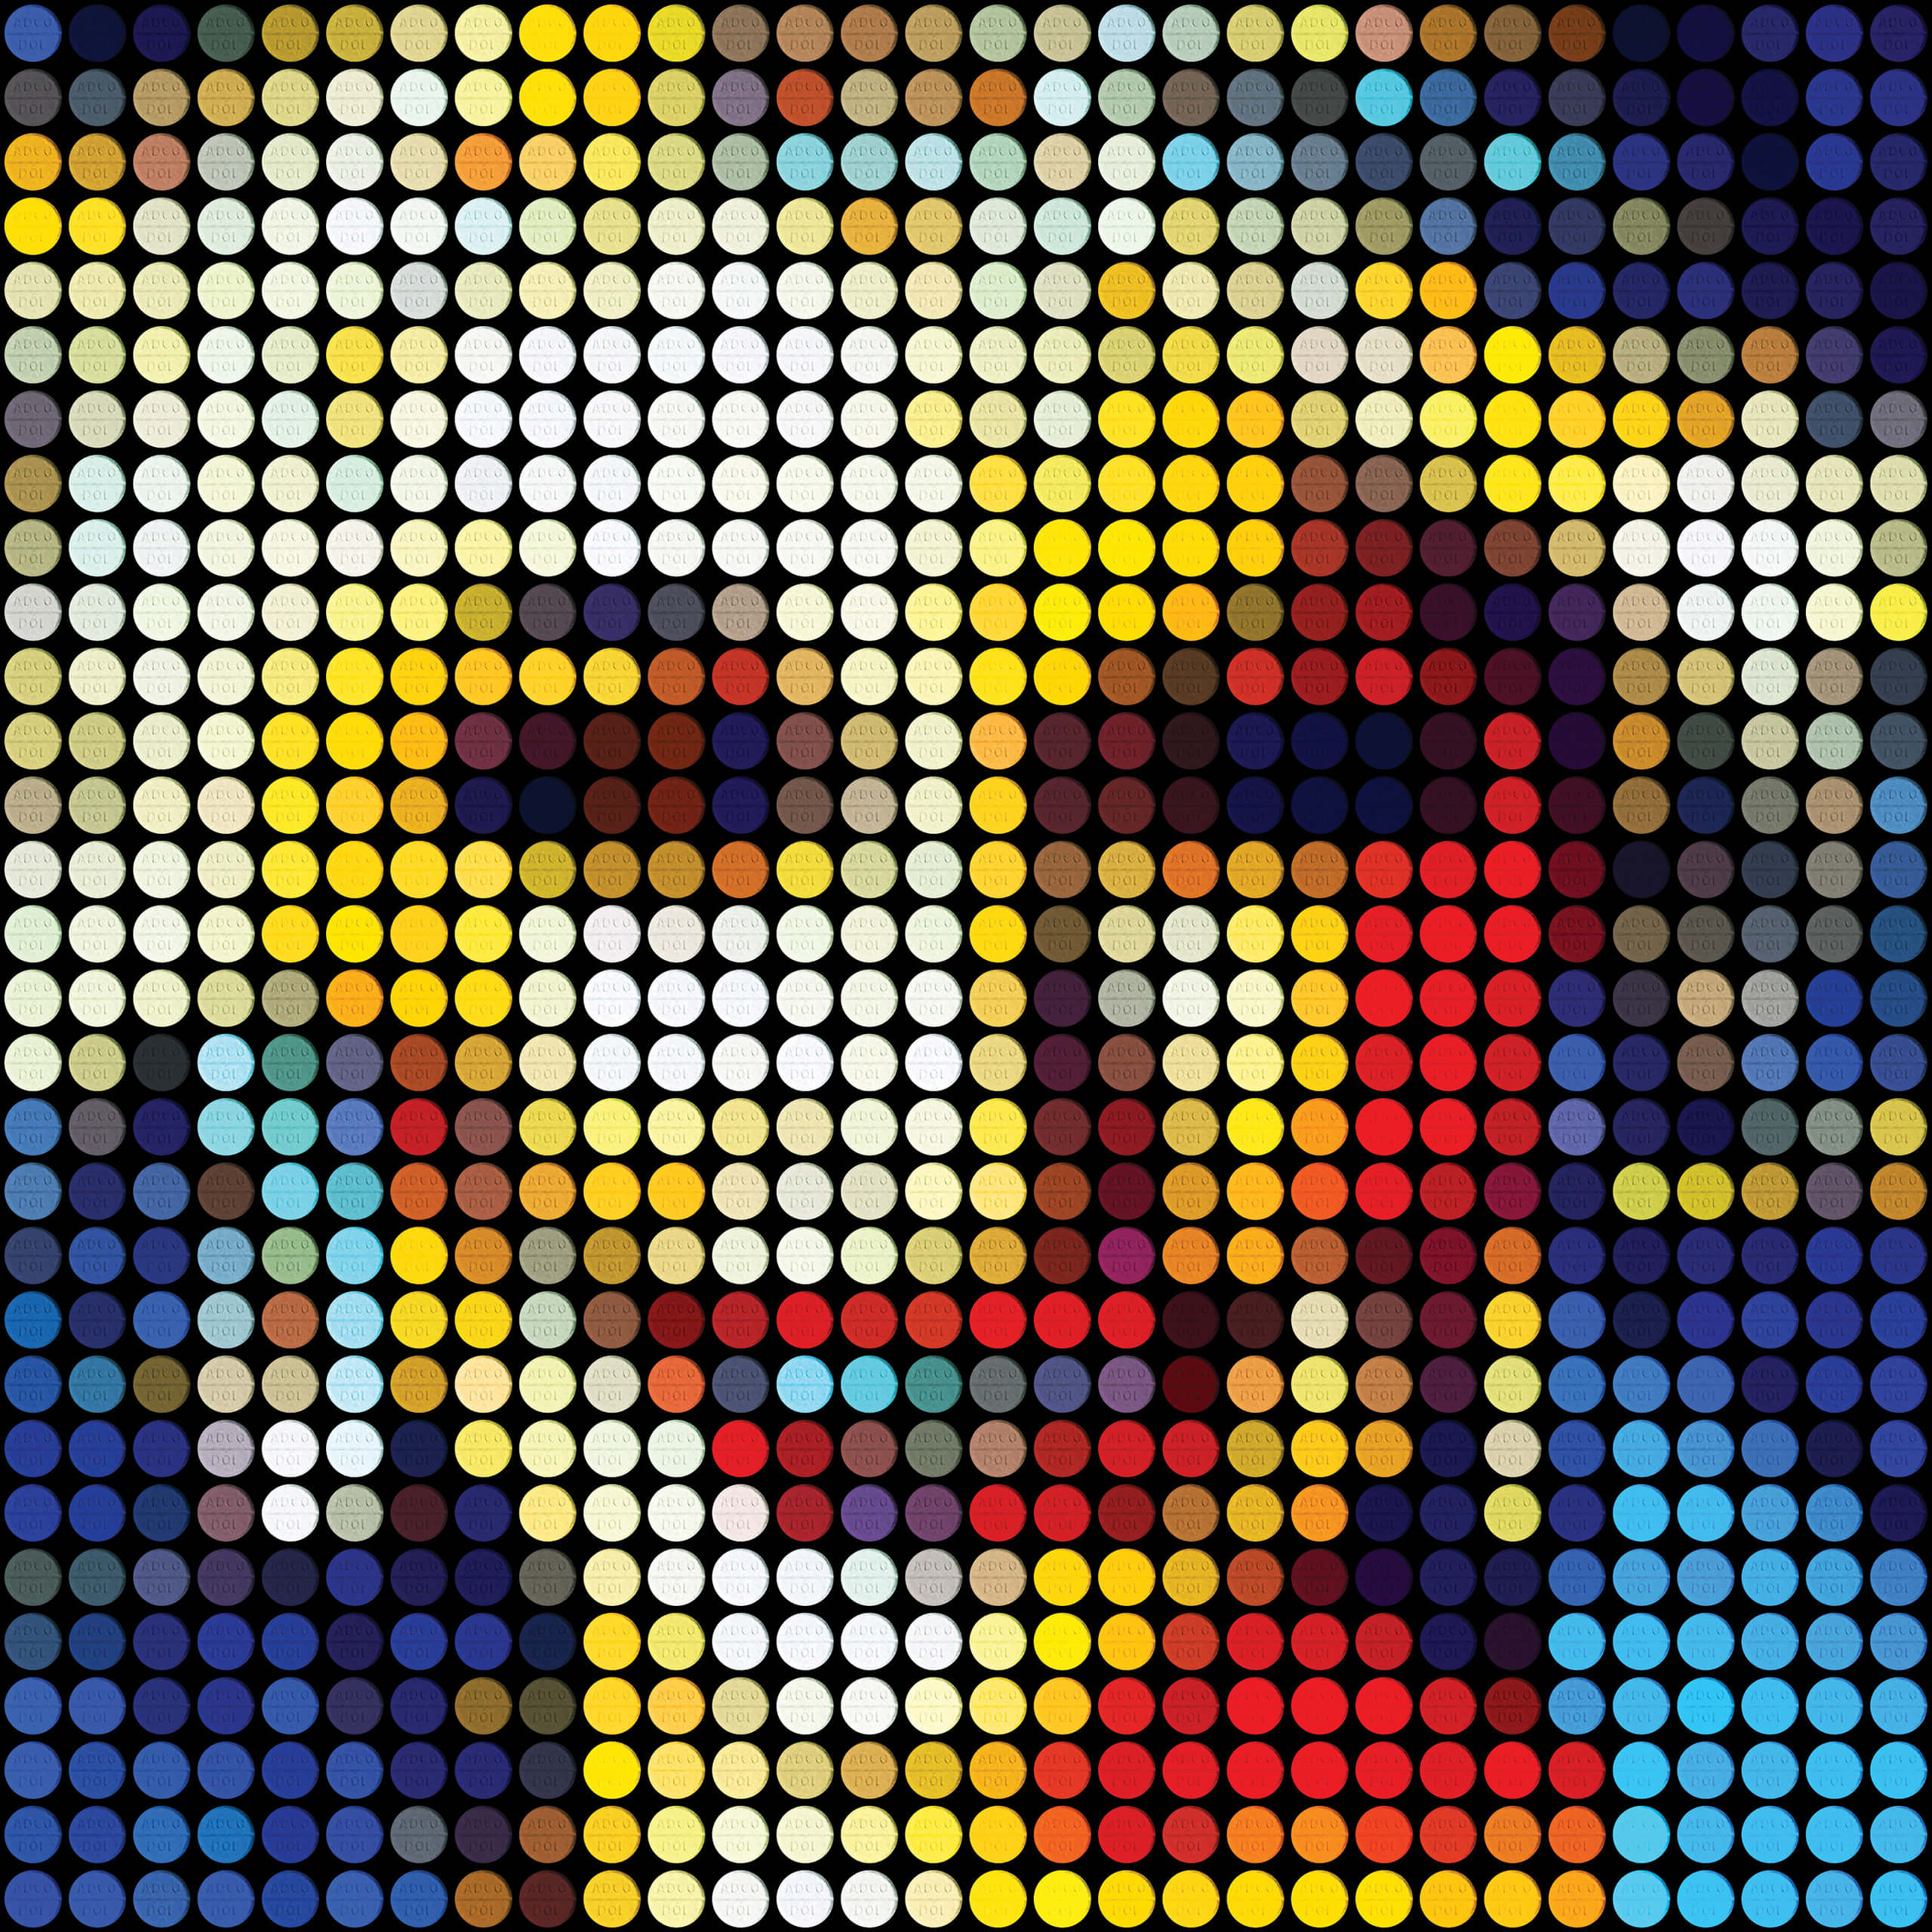 Artwork: Dolly on Dolly (2019) | Reiner Swanepoel | Digital graphic print, 21cm x 21cm | Onomatopoeia, Port Elizabeth | R50.00 per digital file